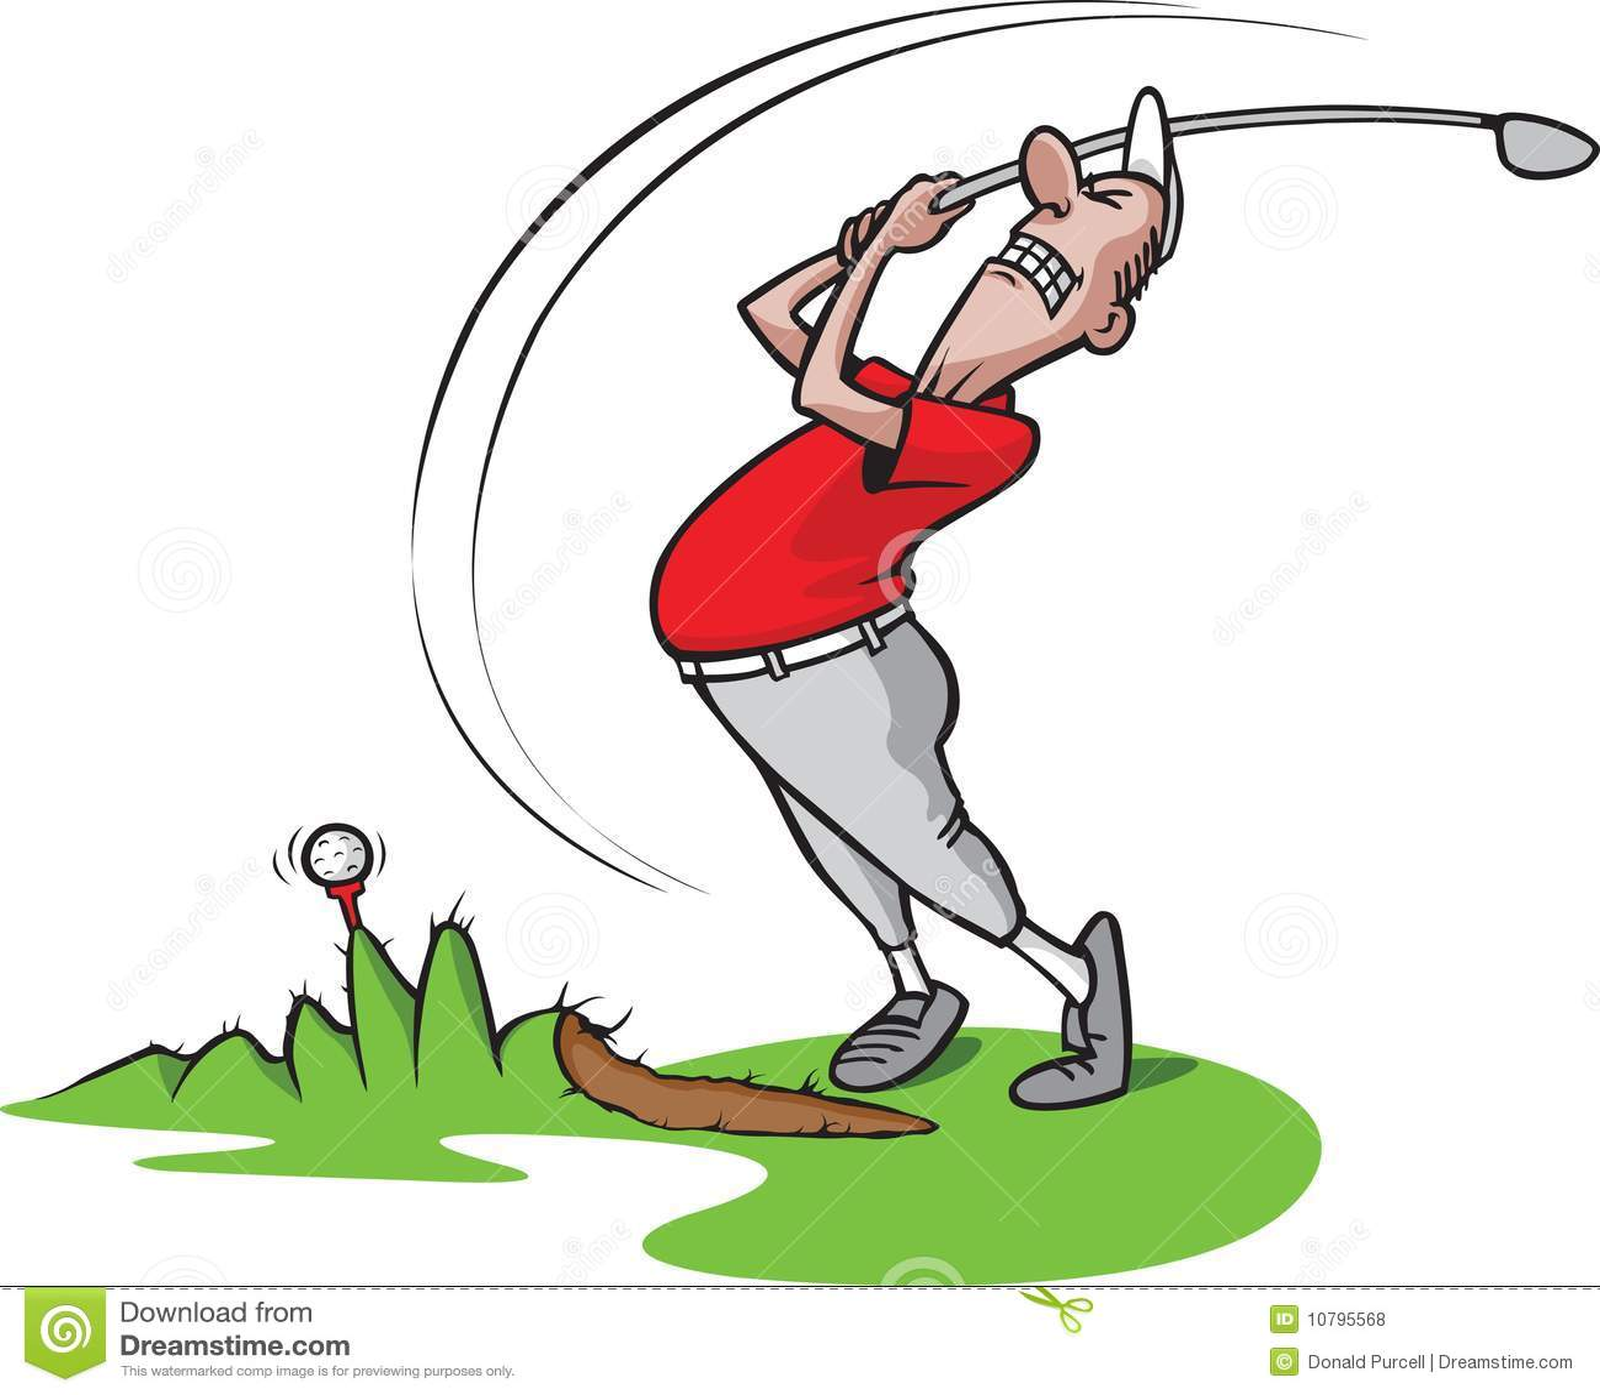 Goofy Golf Guy 3 Stock Vector. Illustration Of Golfer